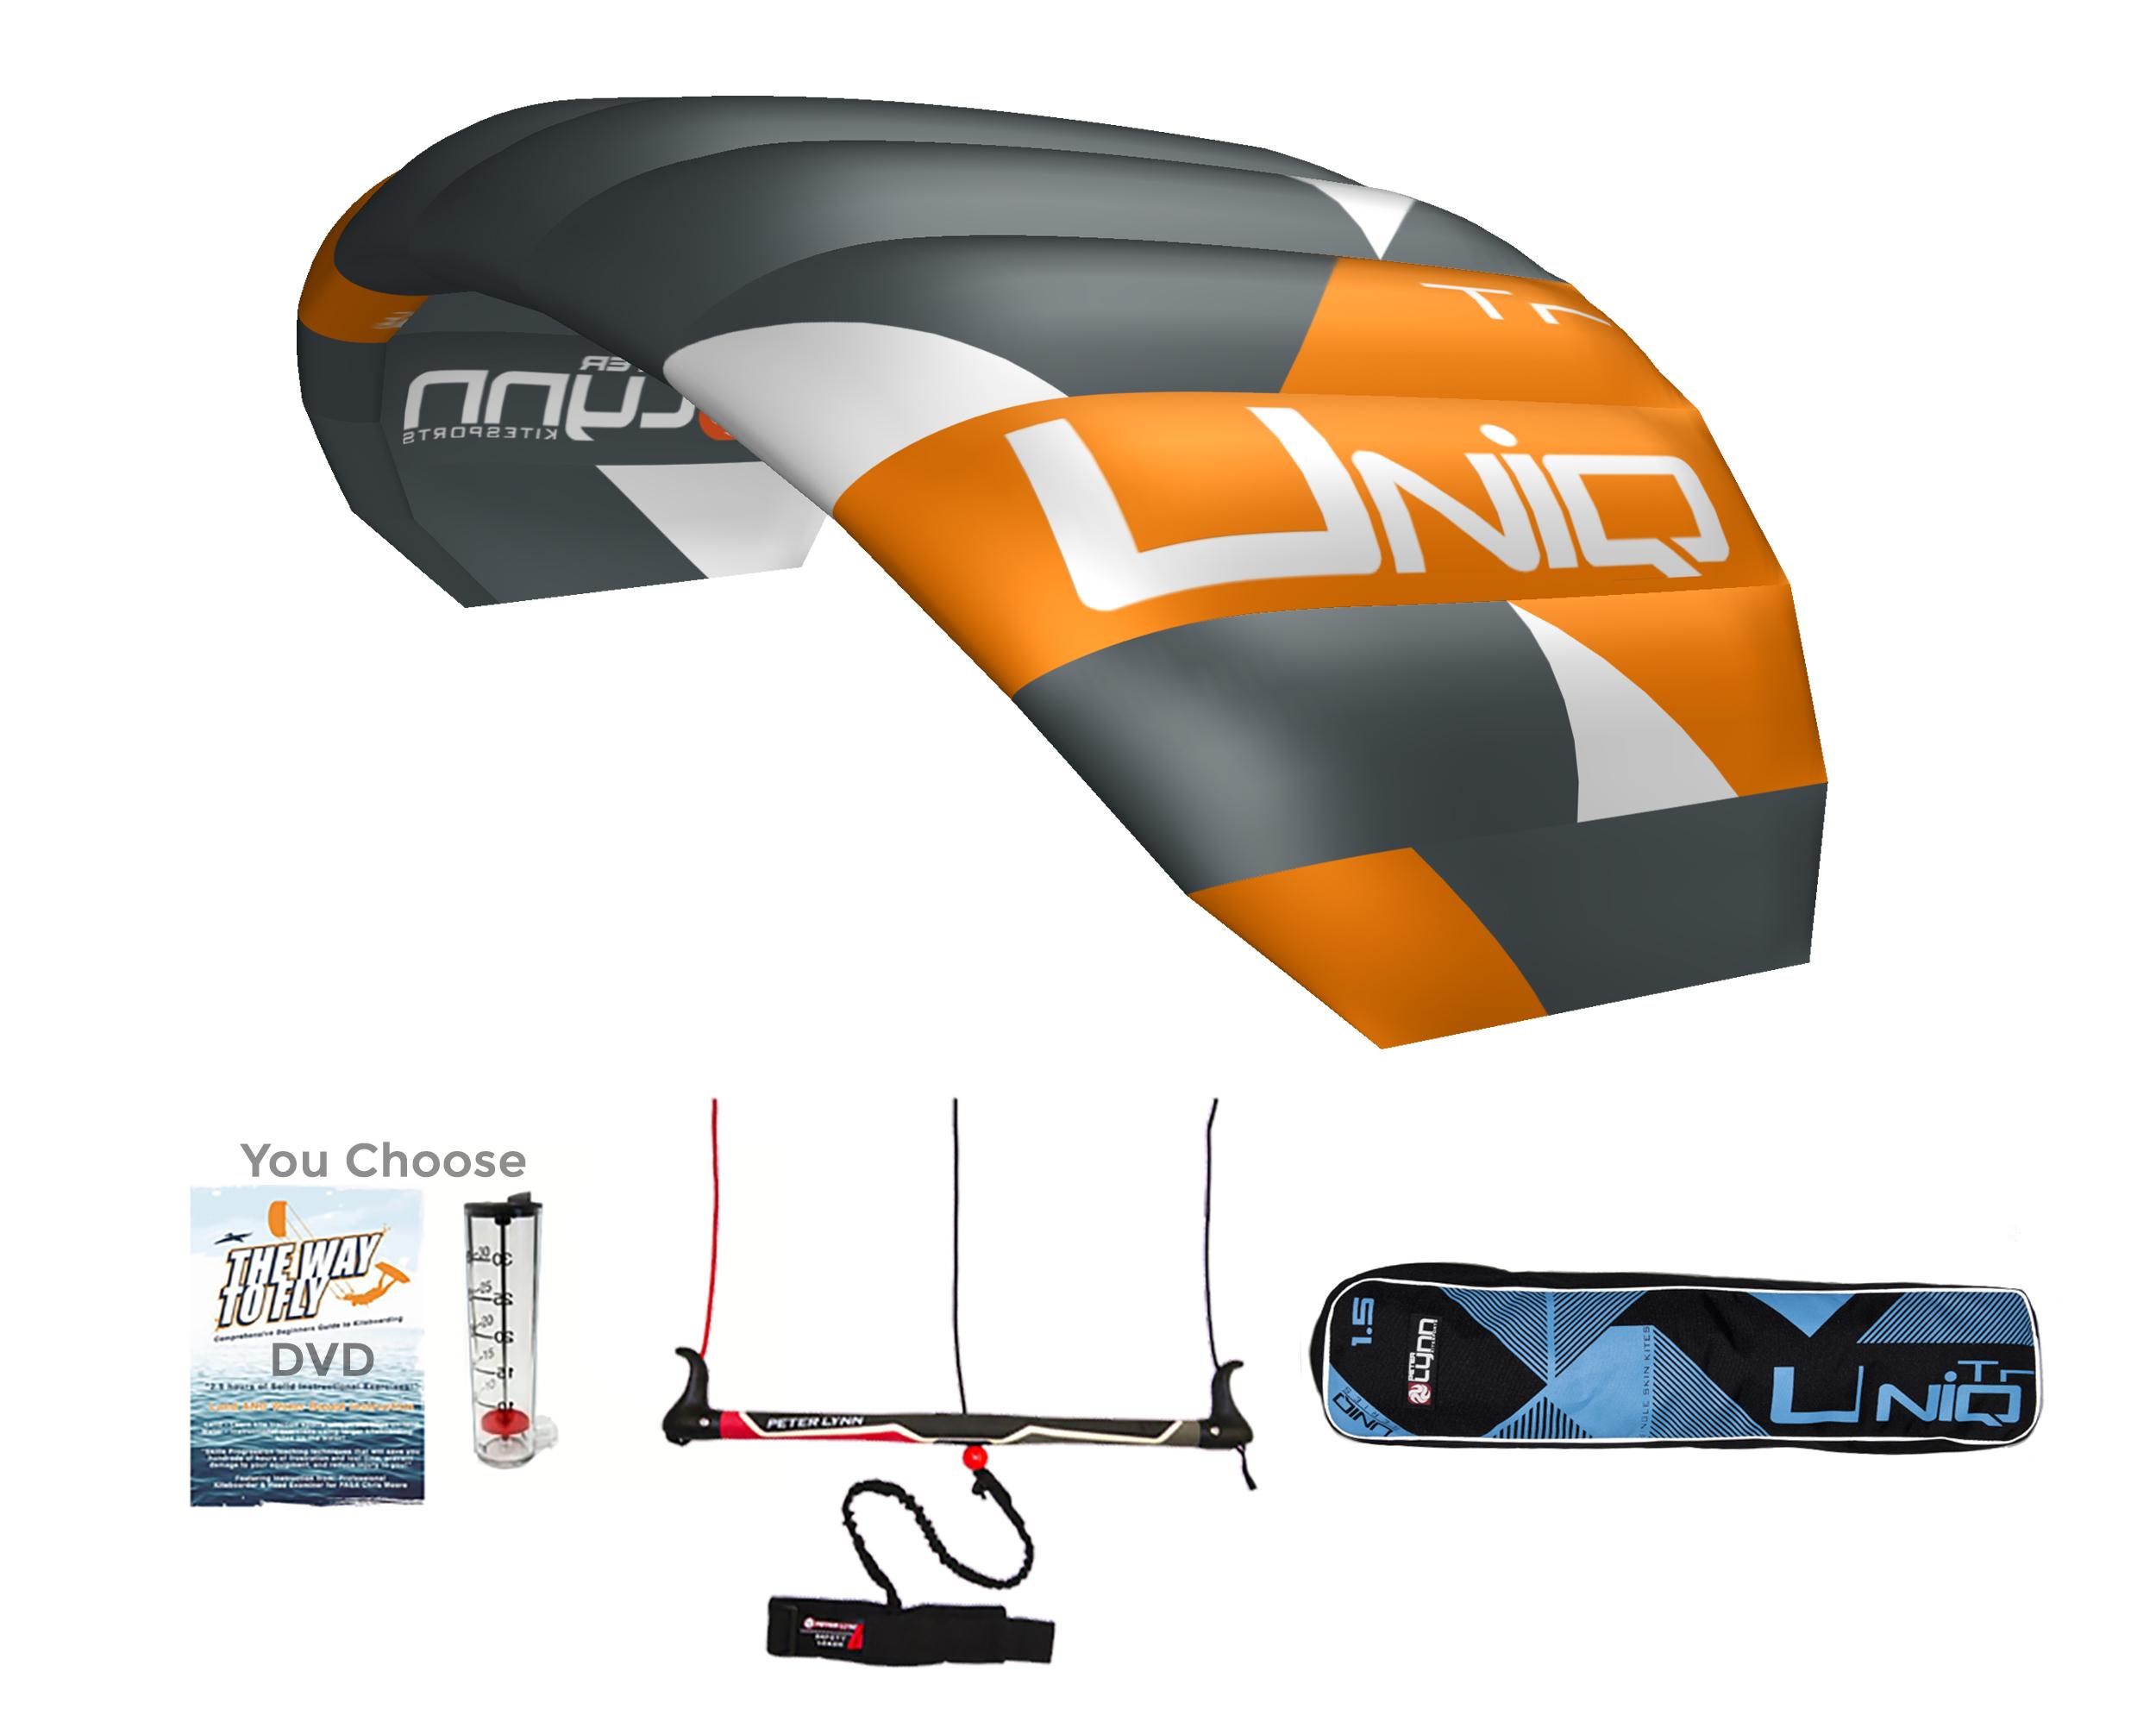 uniq-tr-2.5m-package.jpg